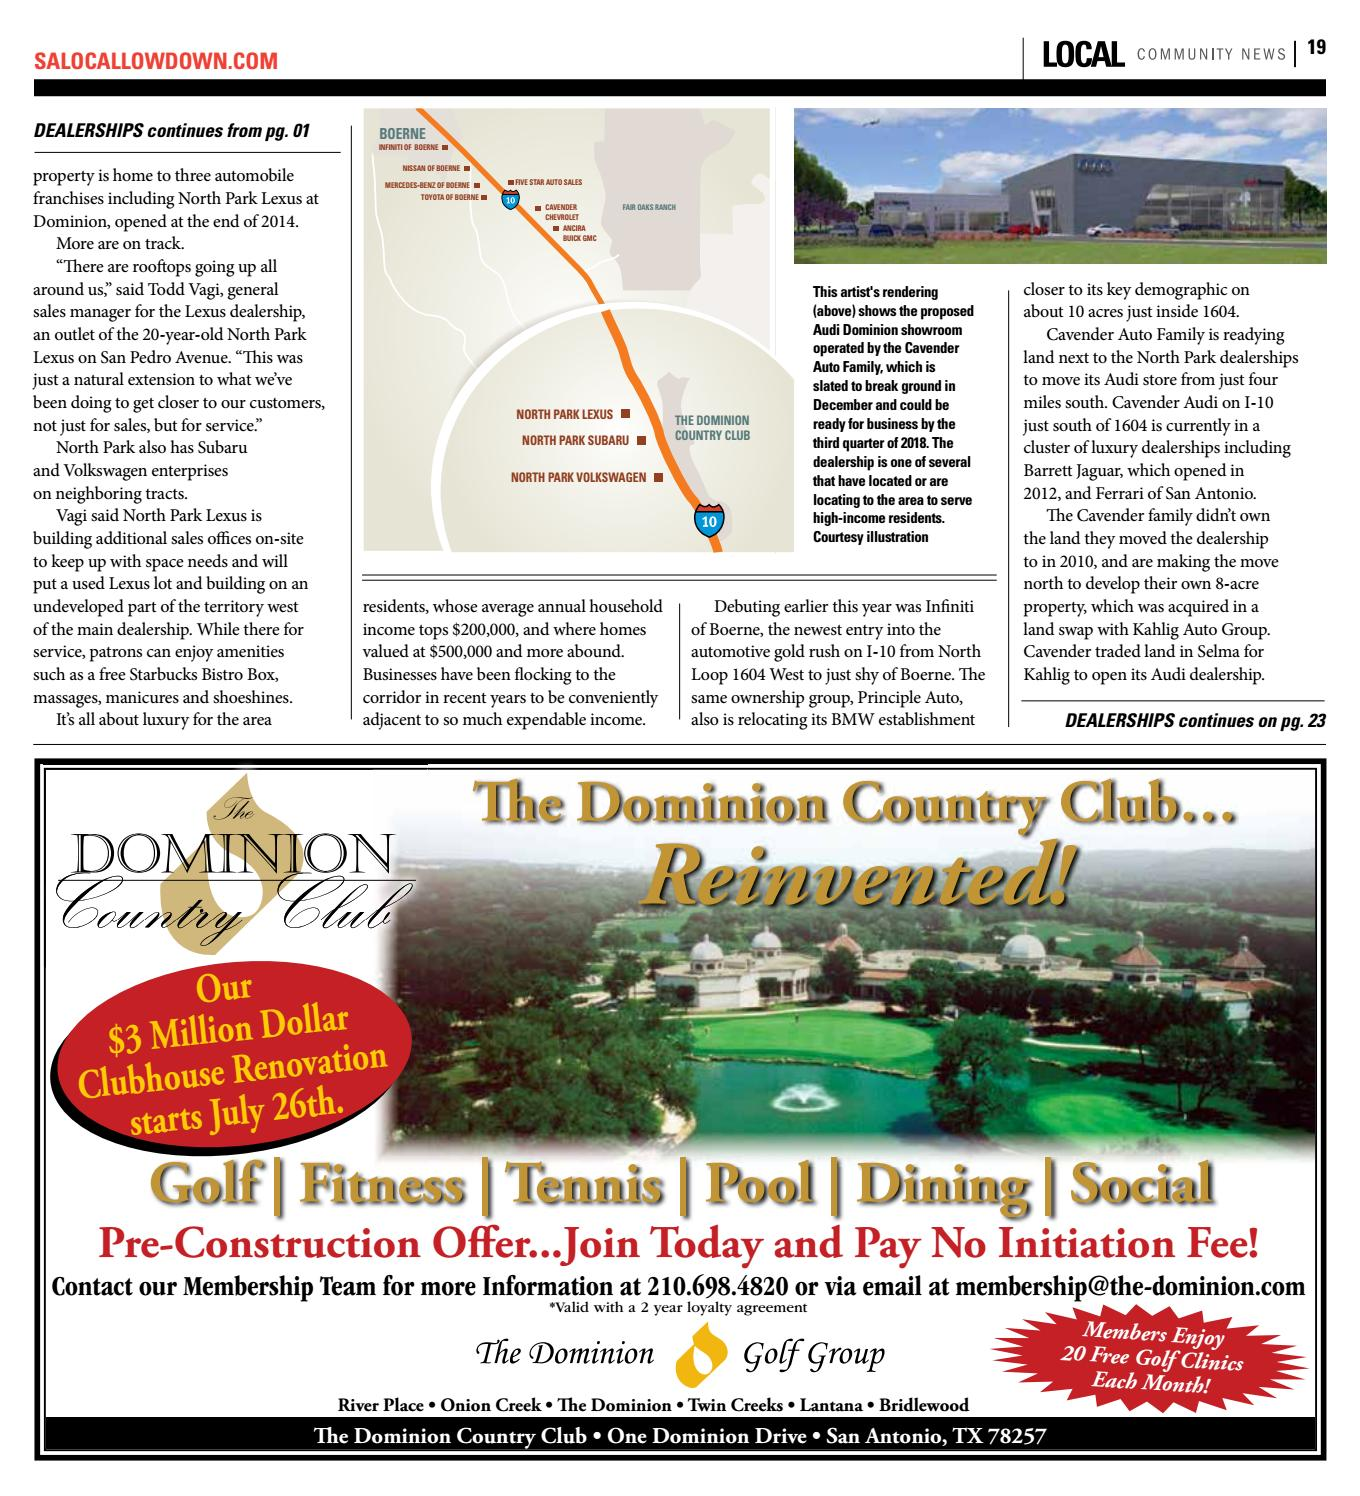 local i 10 corridor leon springs fair oaks ranch the dominion sonoma ranch july 2016 by san antonio local community news issuu leon springs fair oaks ranch